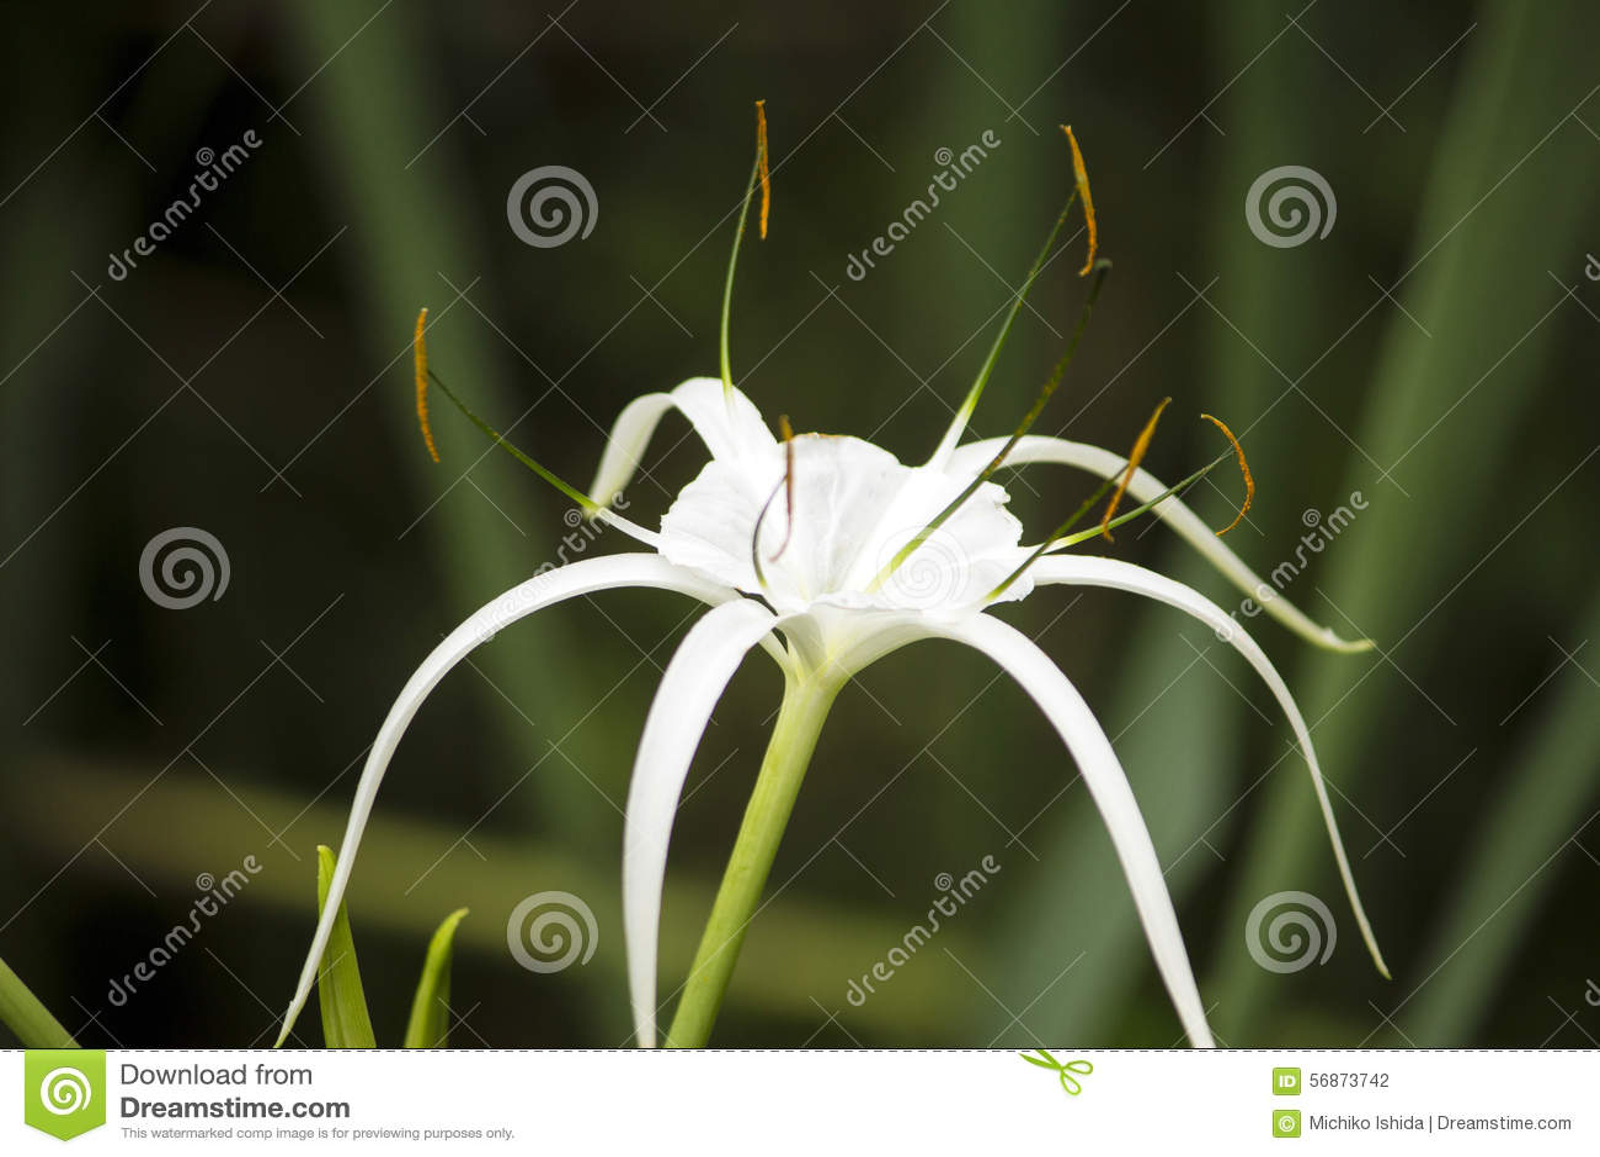 White lily like flower spider lily stock photo image of flower white lily like flower spider lily izmirmasajfo